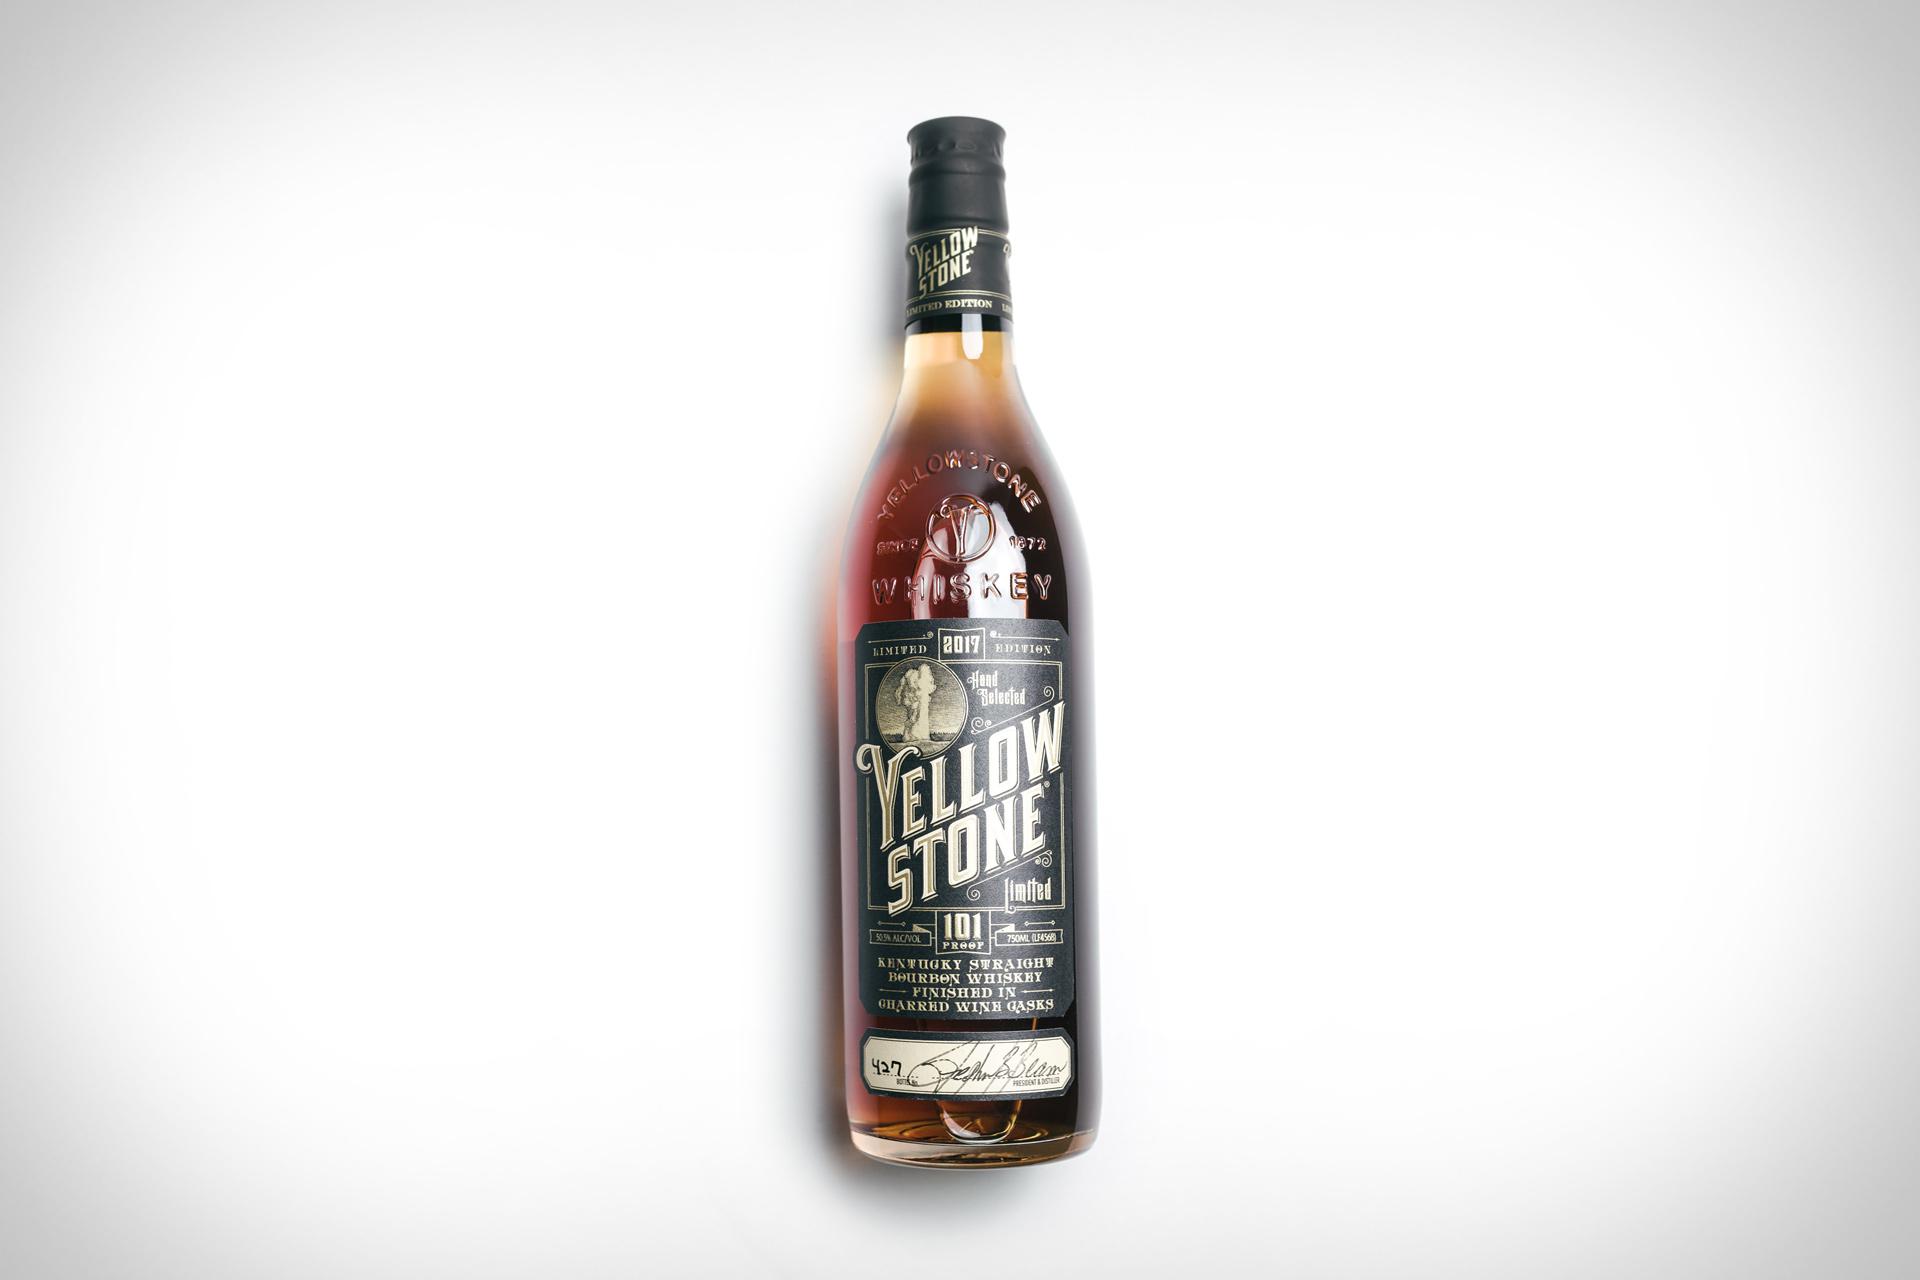 Yellowstone Limited Edition Bourbon